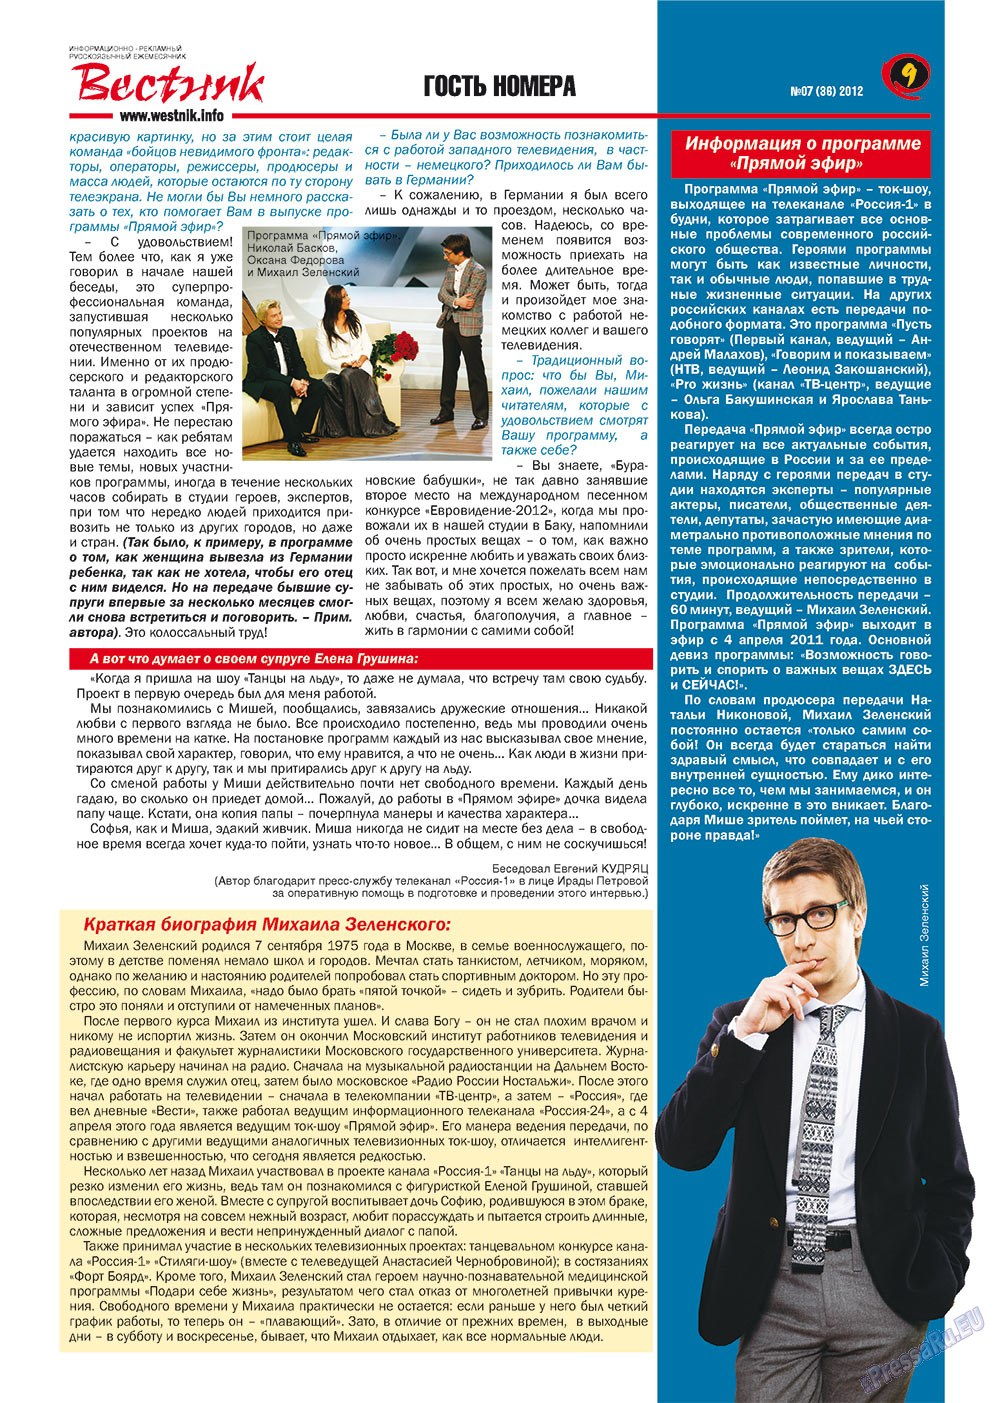 Вестник-info (журнал). 2012 год, номер 7, стр. 9